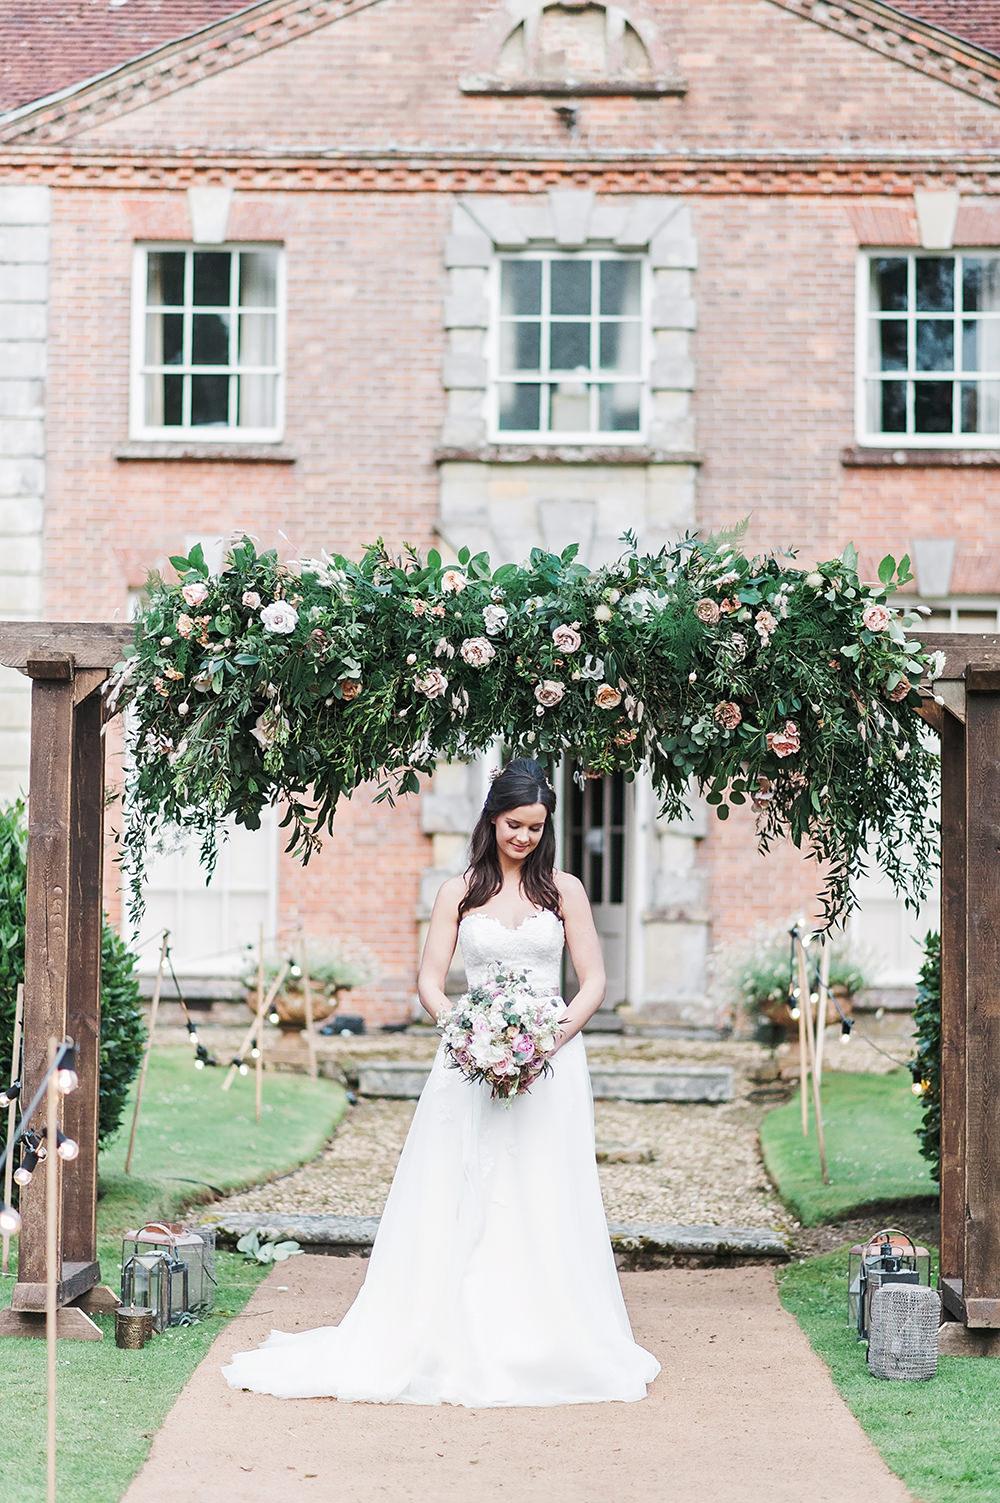 Bride Bridal Gown Dress Strapless Sweetheart Neckline Ribbon Belt Pink Greenery Foliage Rose Arch Edmondsham House Wedding Darima Frampton Photography